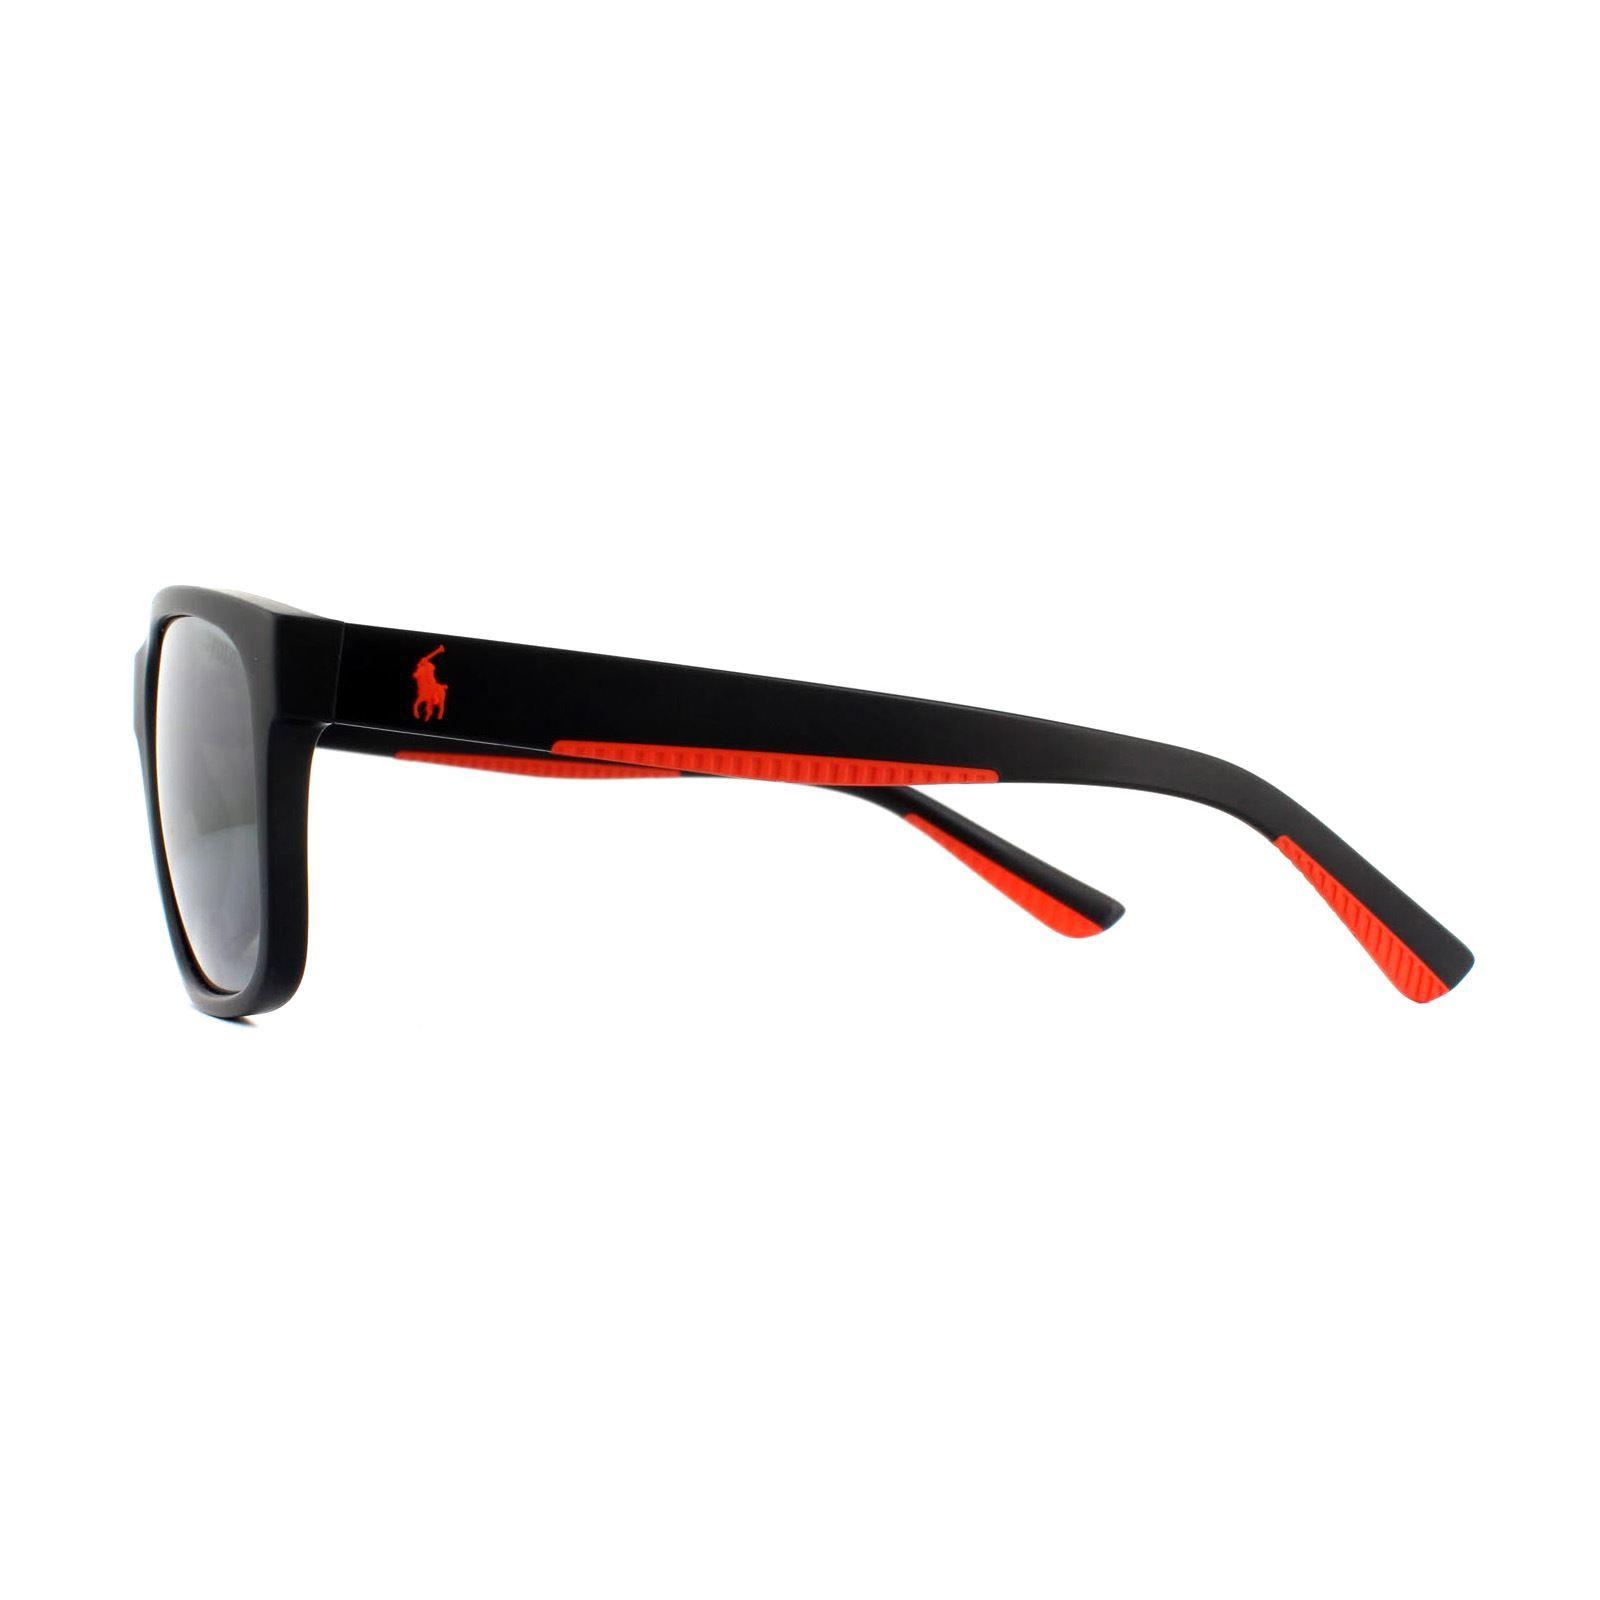 Polo Ralph Lauren Sunglasses PH4142 57326G Matte Black Silver Mirror